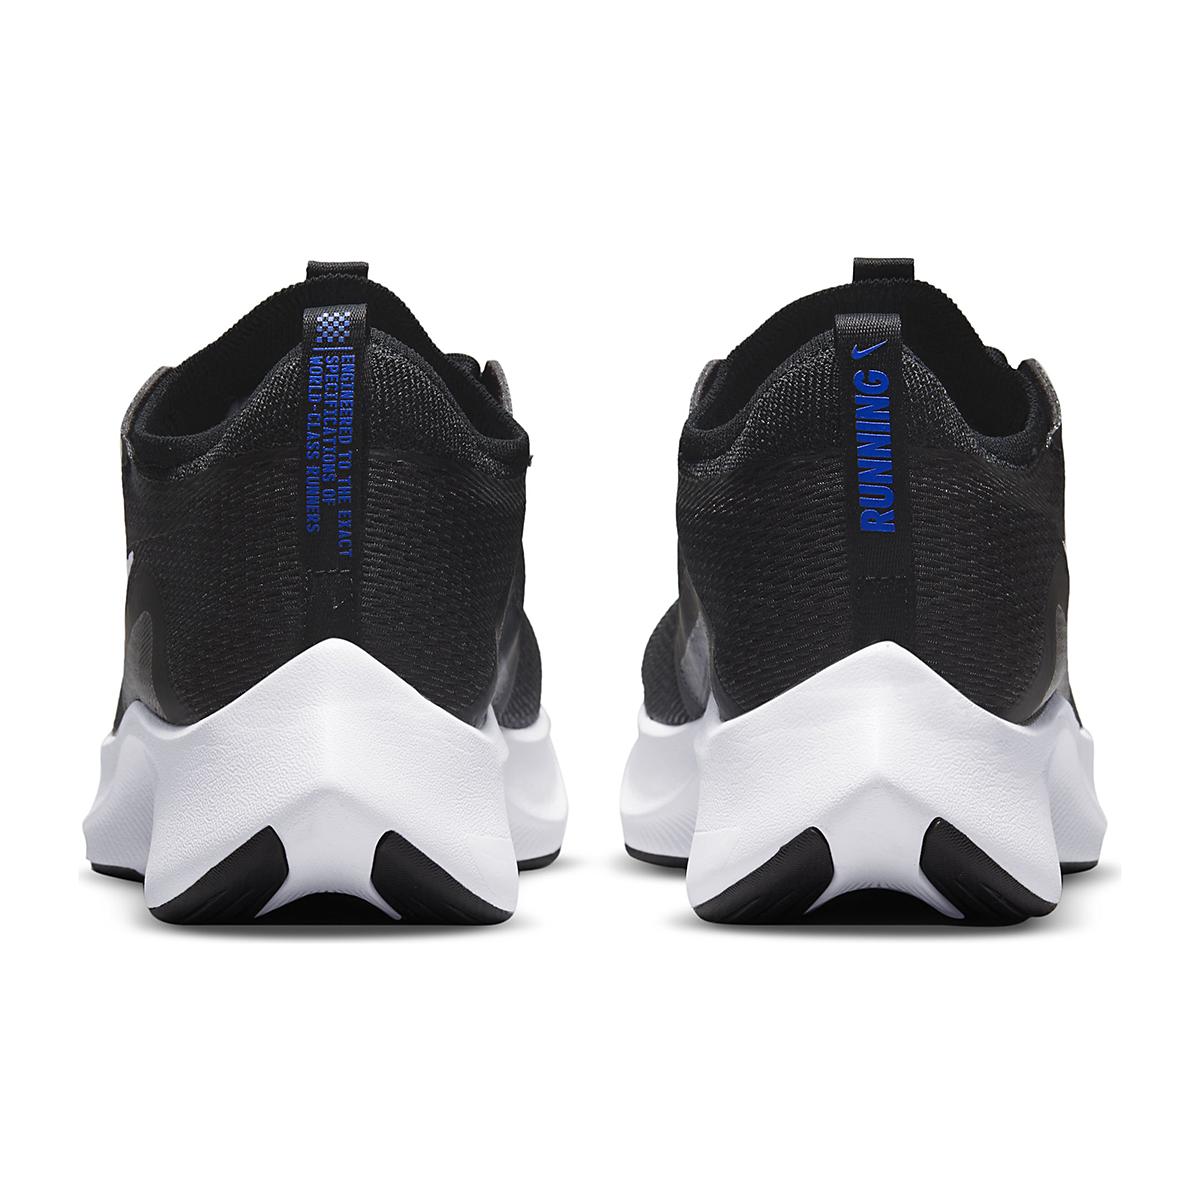 Men's Nike Zoom Fly 4 Running Shoe - Color: Black/White/Anthracite/Racer Blue - Size: 6 - Width: Regular, Black/White/Anthracite/Racer Blue, large, image 5